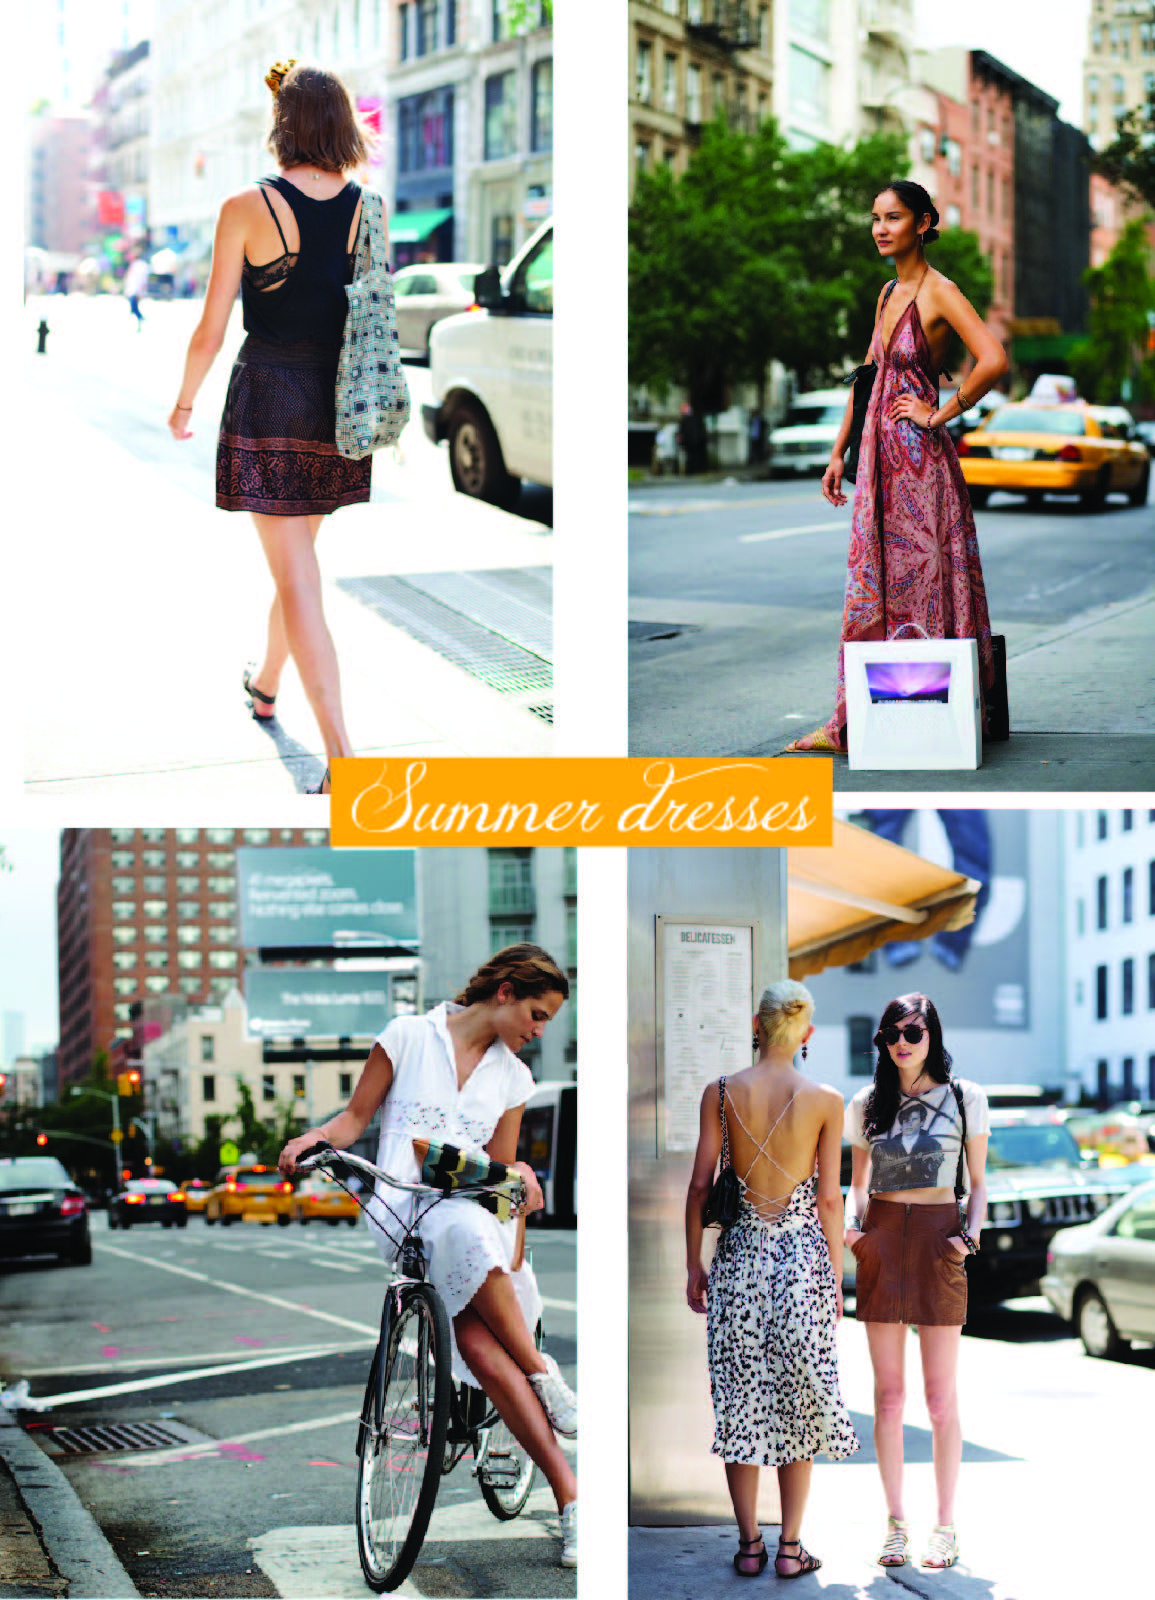 Summer dresses as seen on http://www.measuretwicecutonce.com.au/2013/10/summer-dresses/